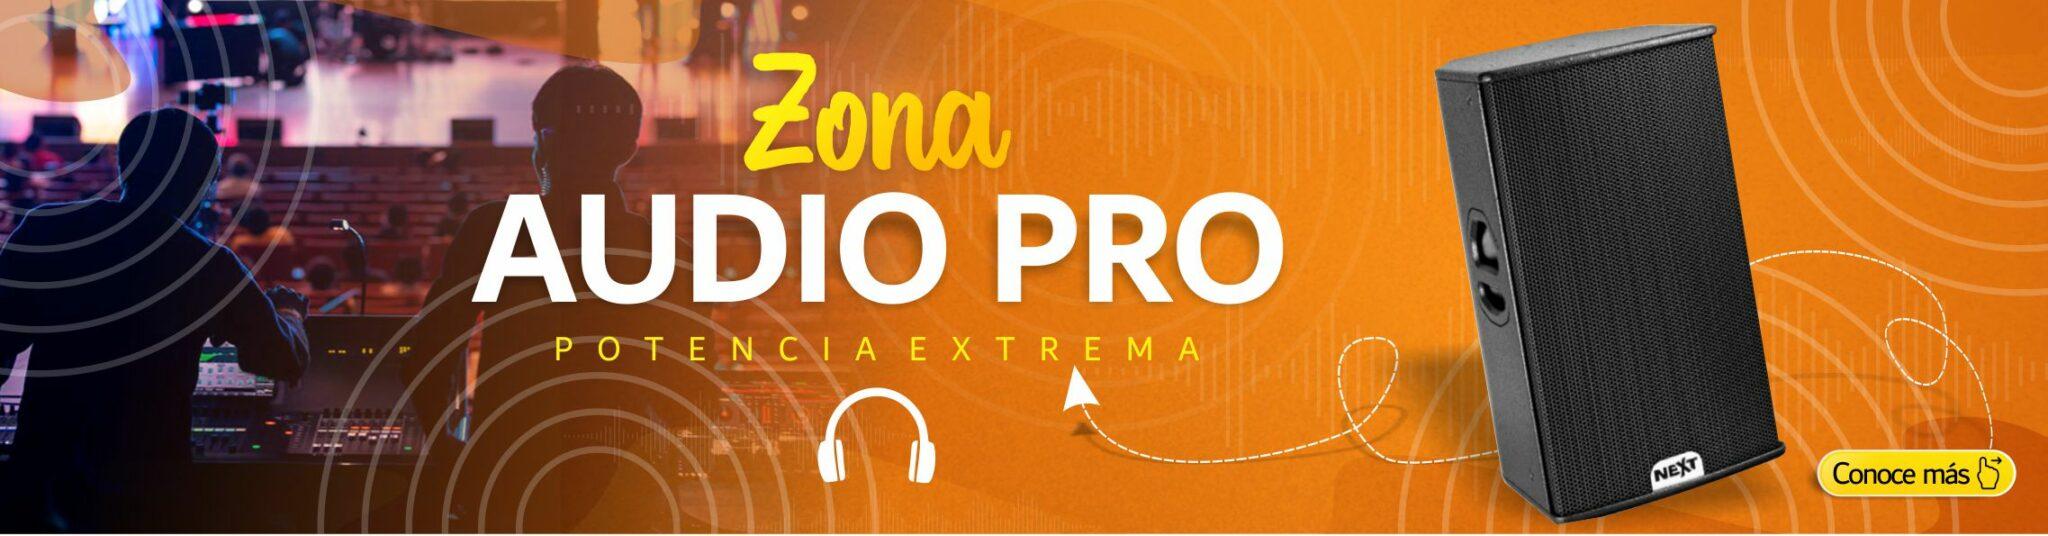 audio pro-banner